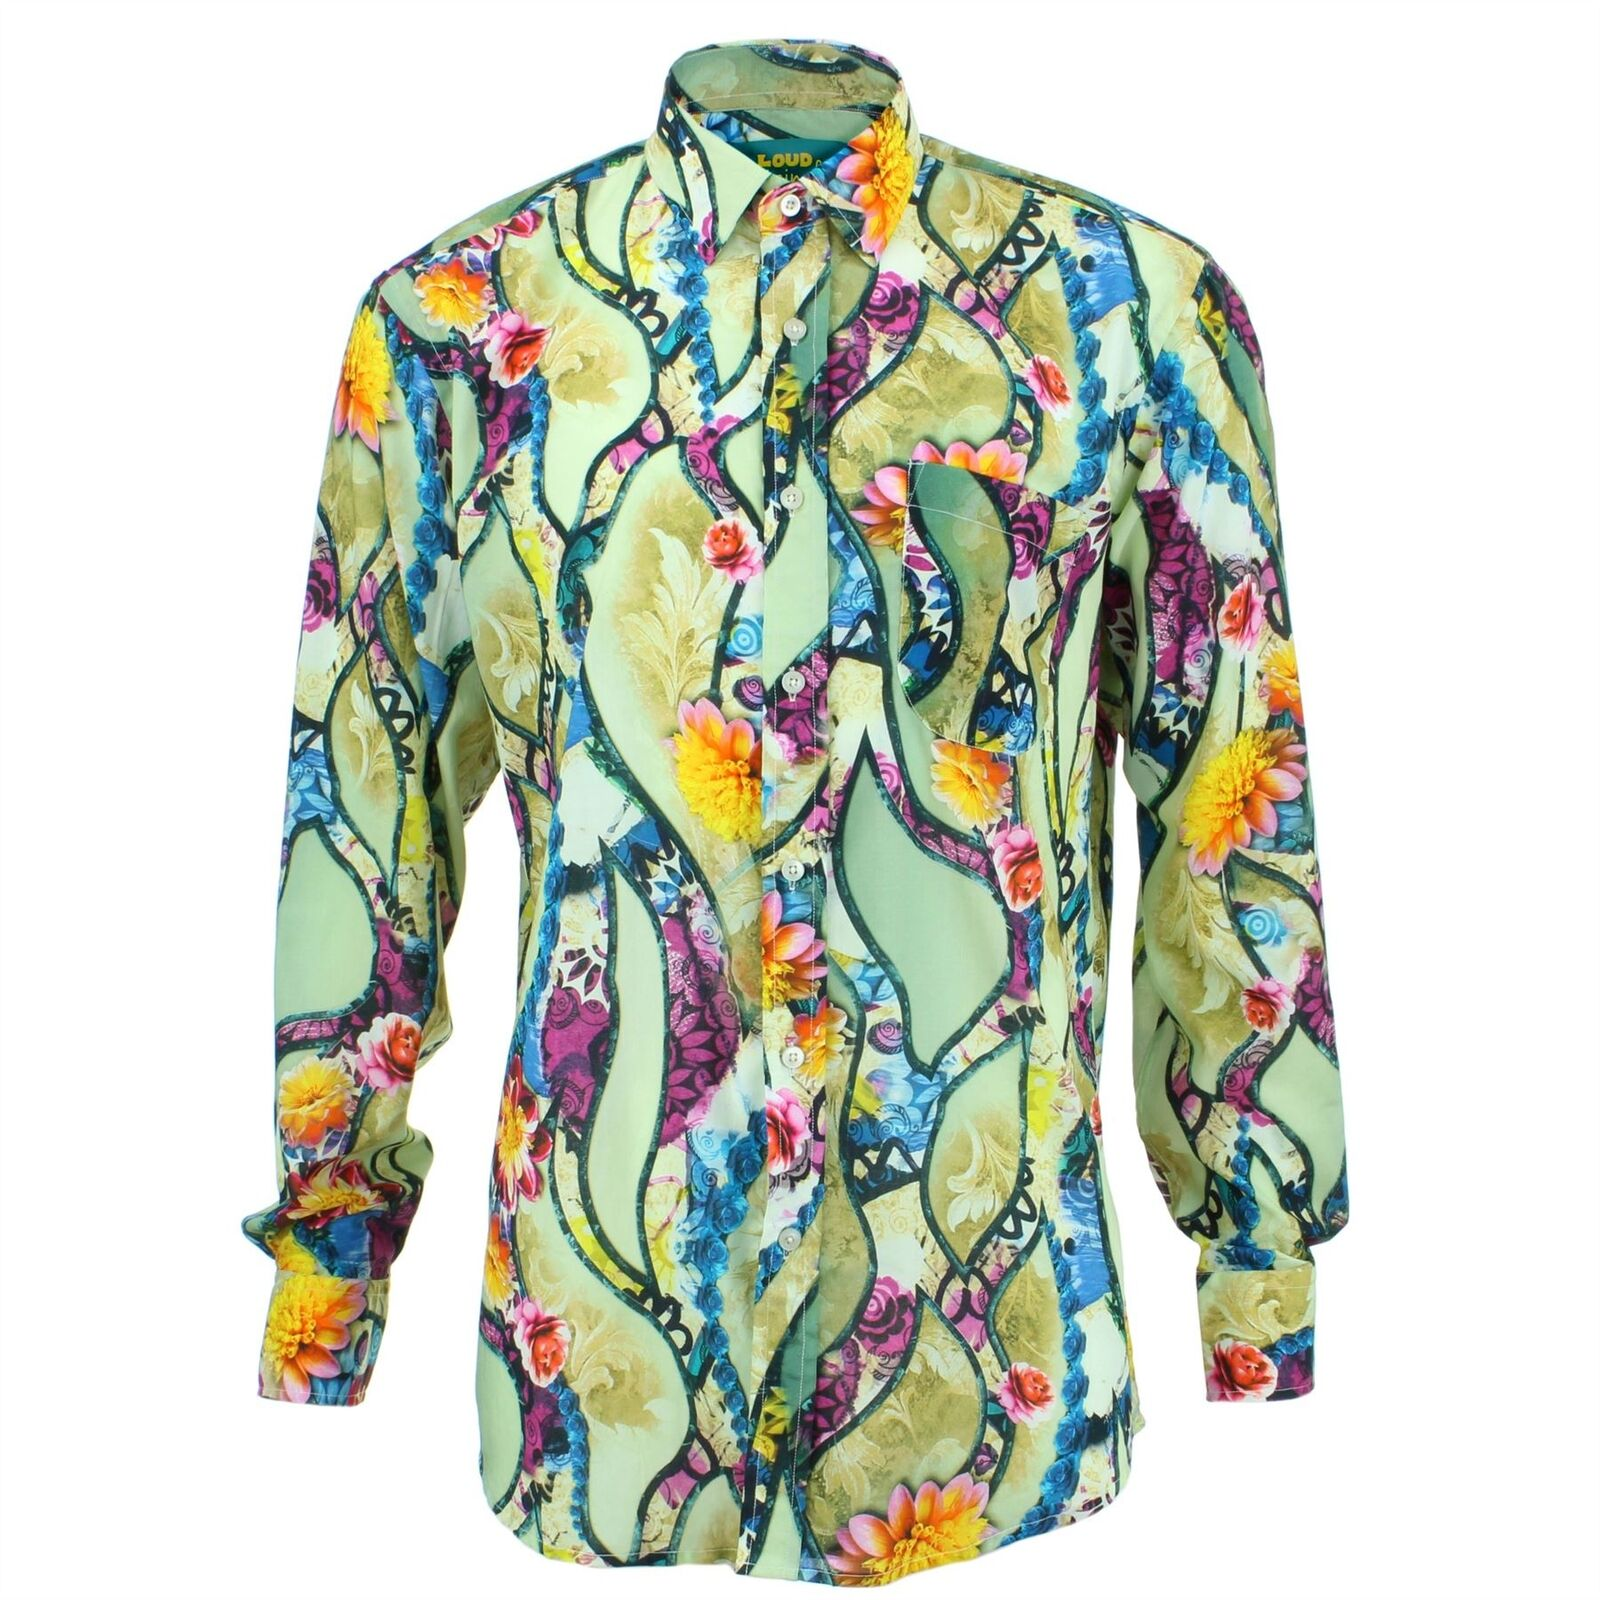 Men's Loud Shirt REGULAR FIT Floral Purple Retro Psychedelic Fancy